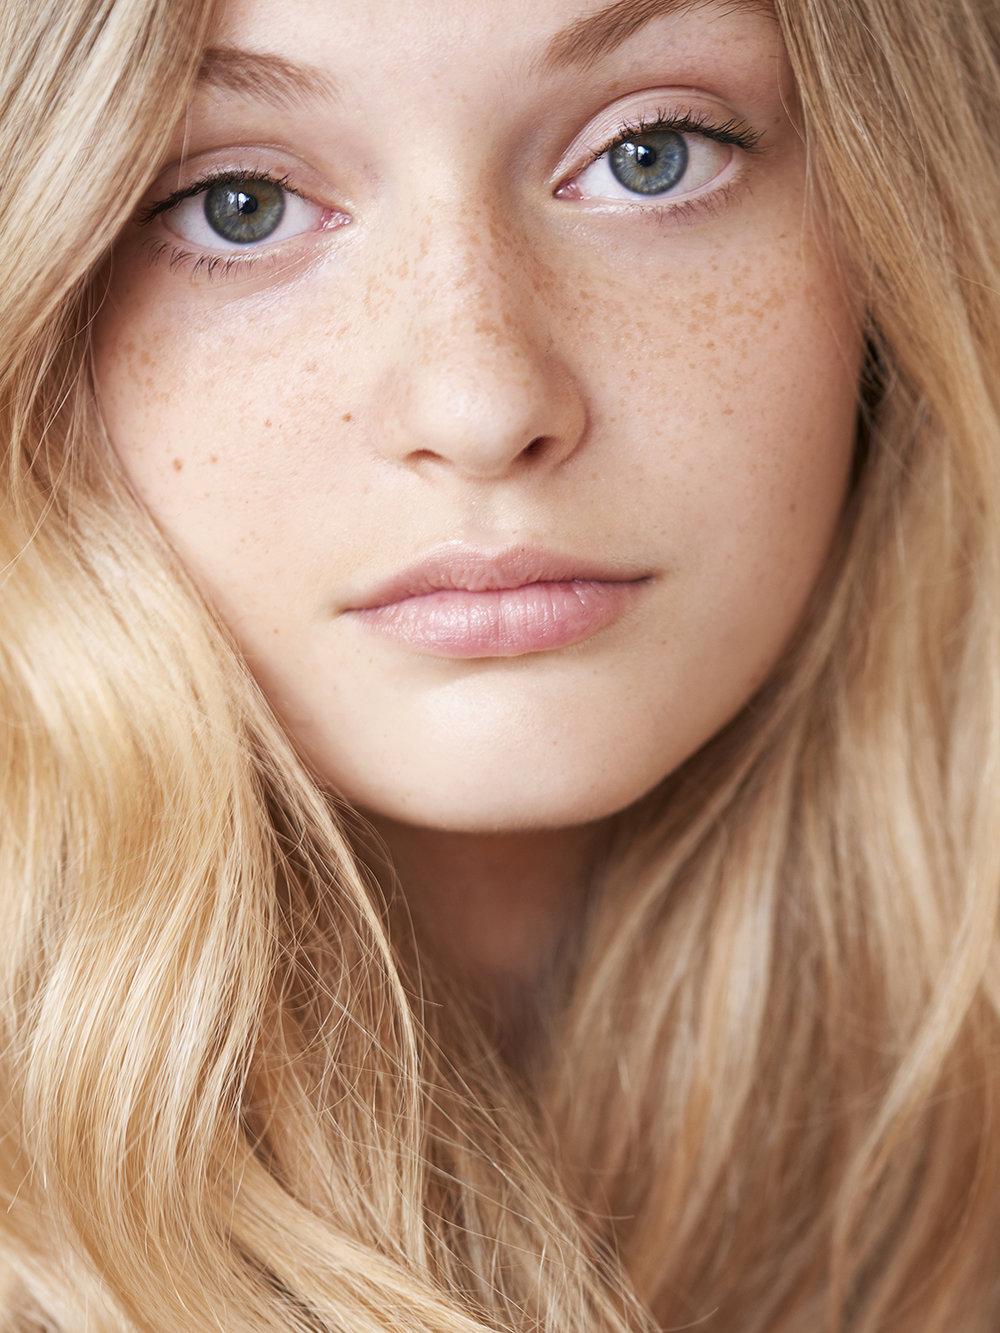 Harten_Nafziger_beauty_photographer_valeri_paumelle_agent (53).jpg